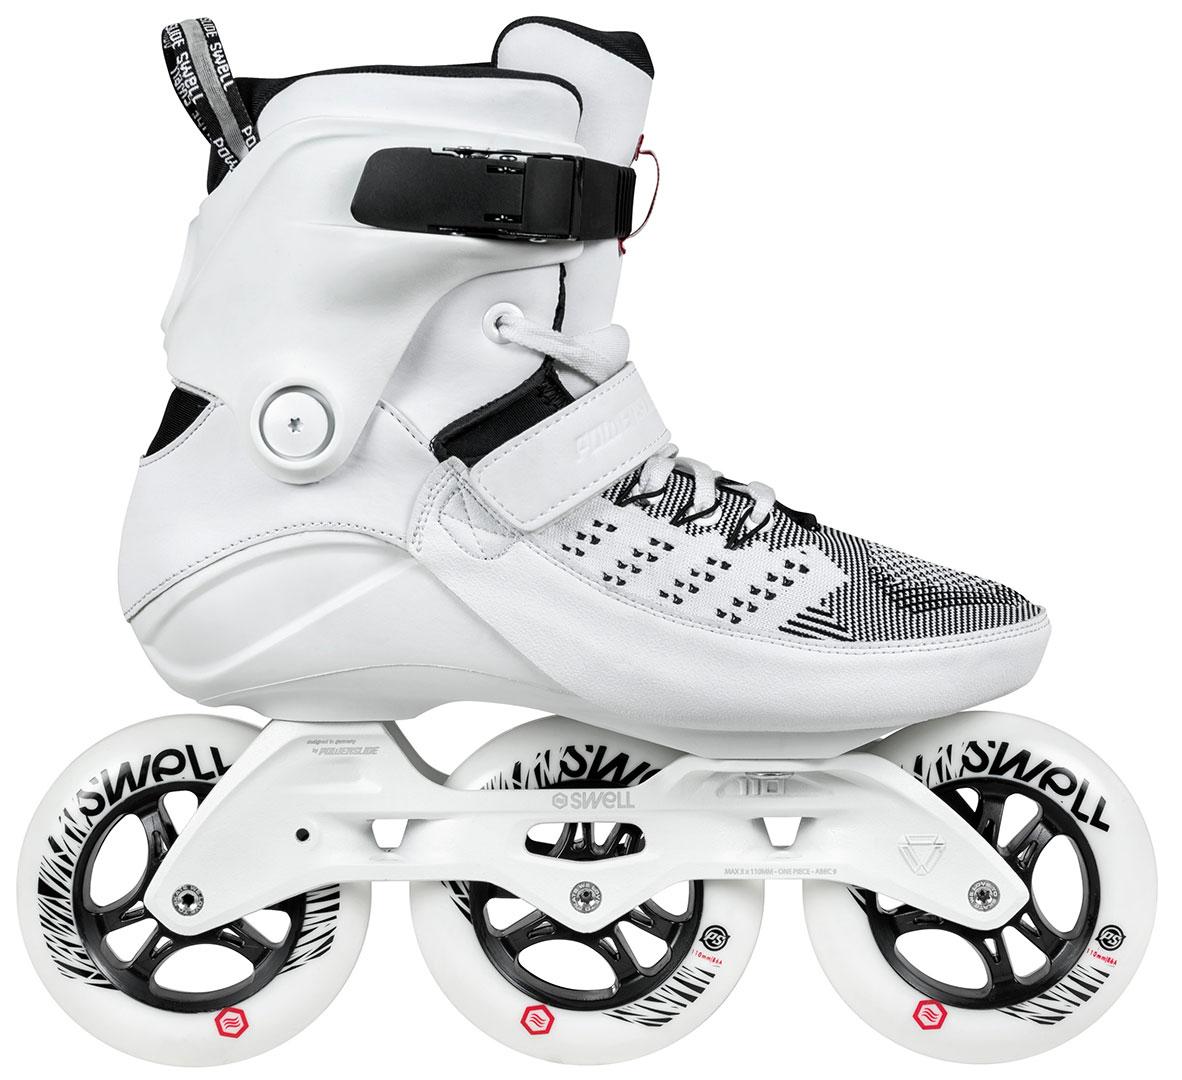 c060fad1dc471 SWELL TRINITY 110 Inline Skate 2019 ultra white